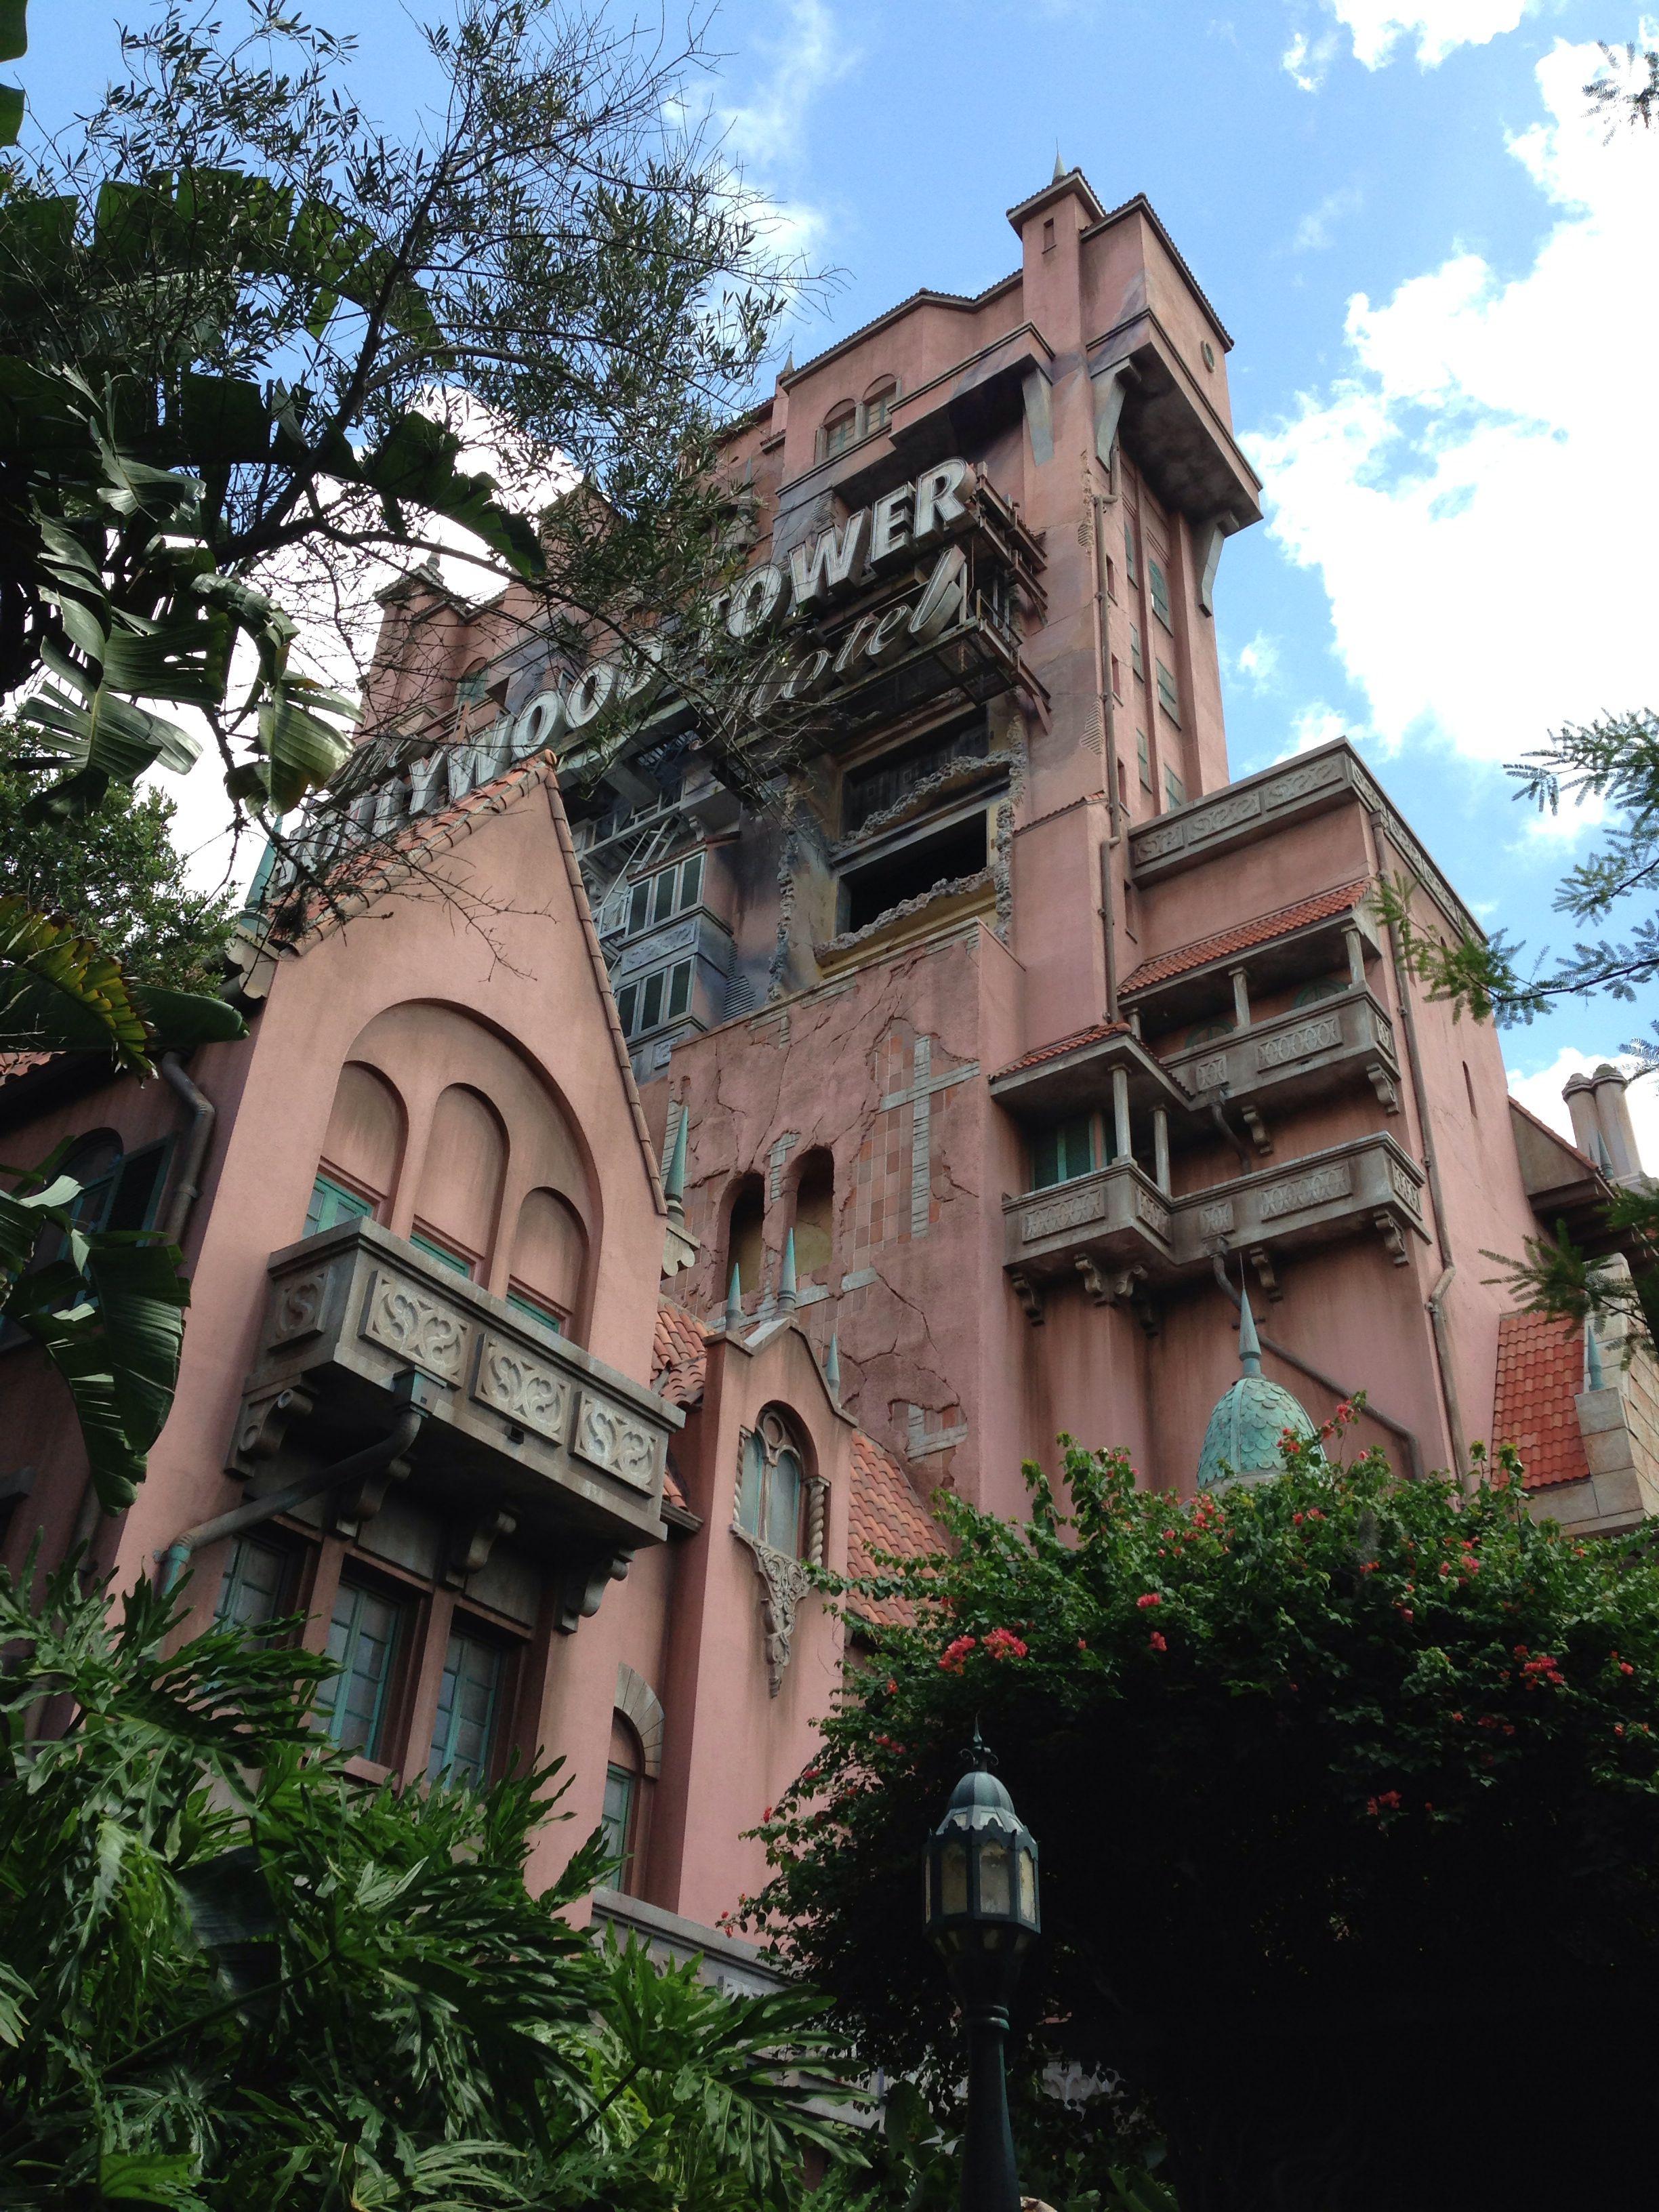 Twilight Zone Tower Of Terror Disneyworld Tower Of Terror House Styles Disney World